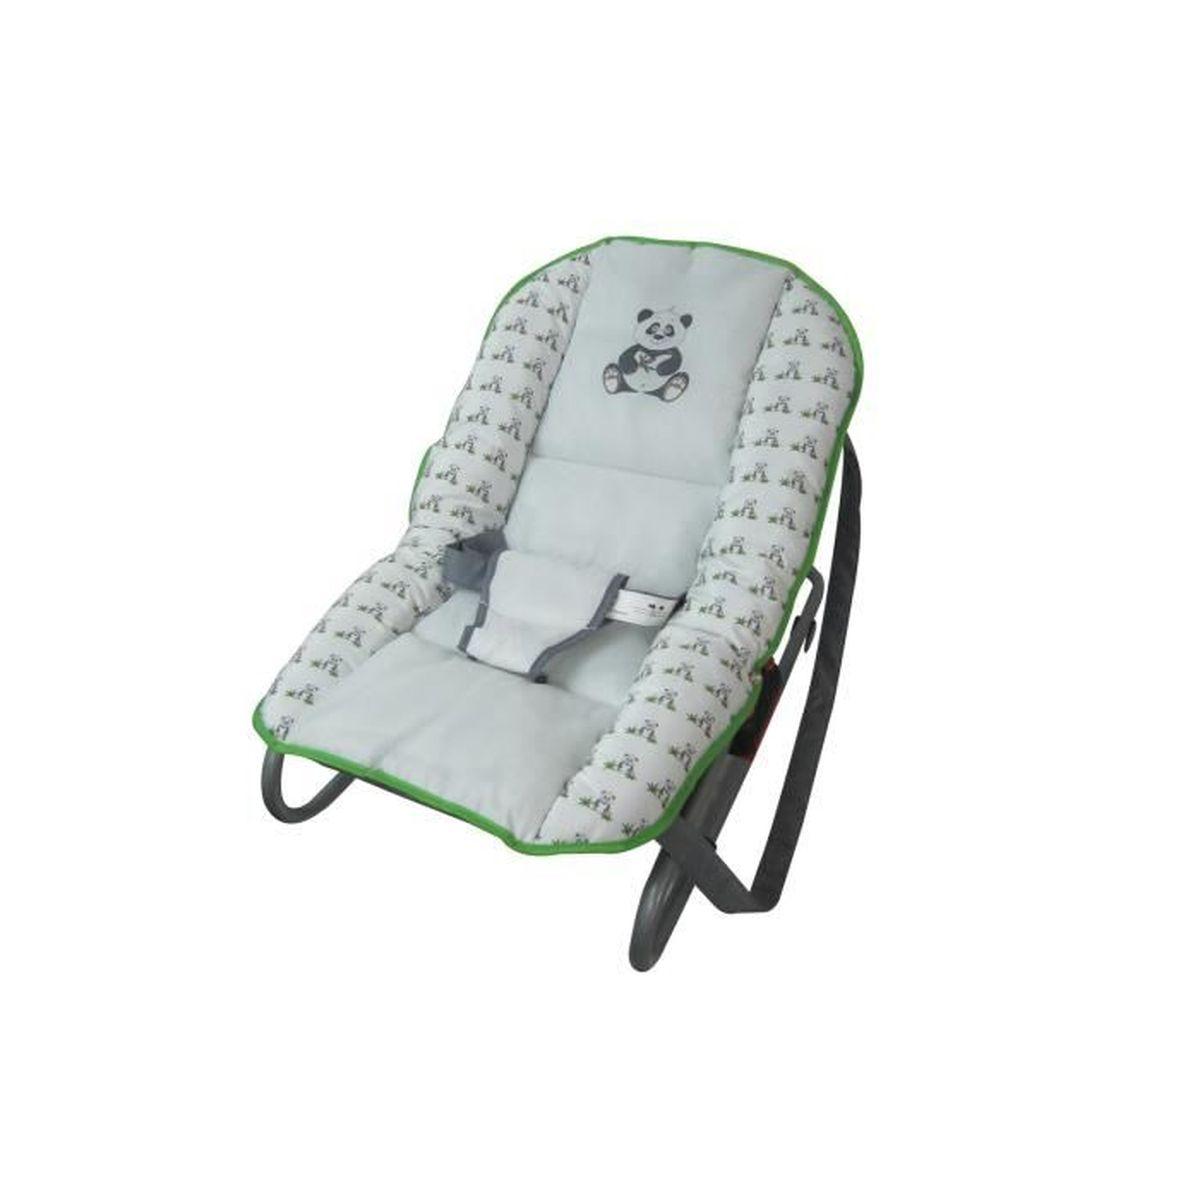 transat relax b b th me panda achat vente transat balancelle 5420044809240 soldes. Black Bedroom Furniture Sets. Home Design Ideas